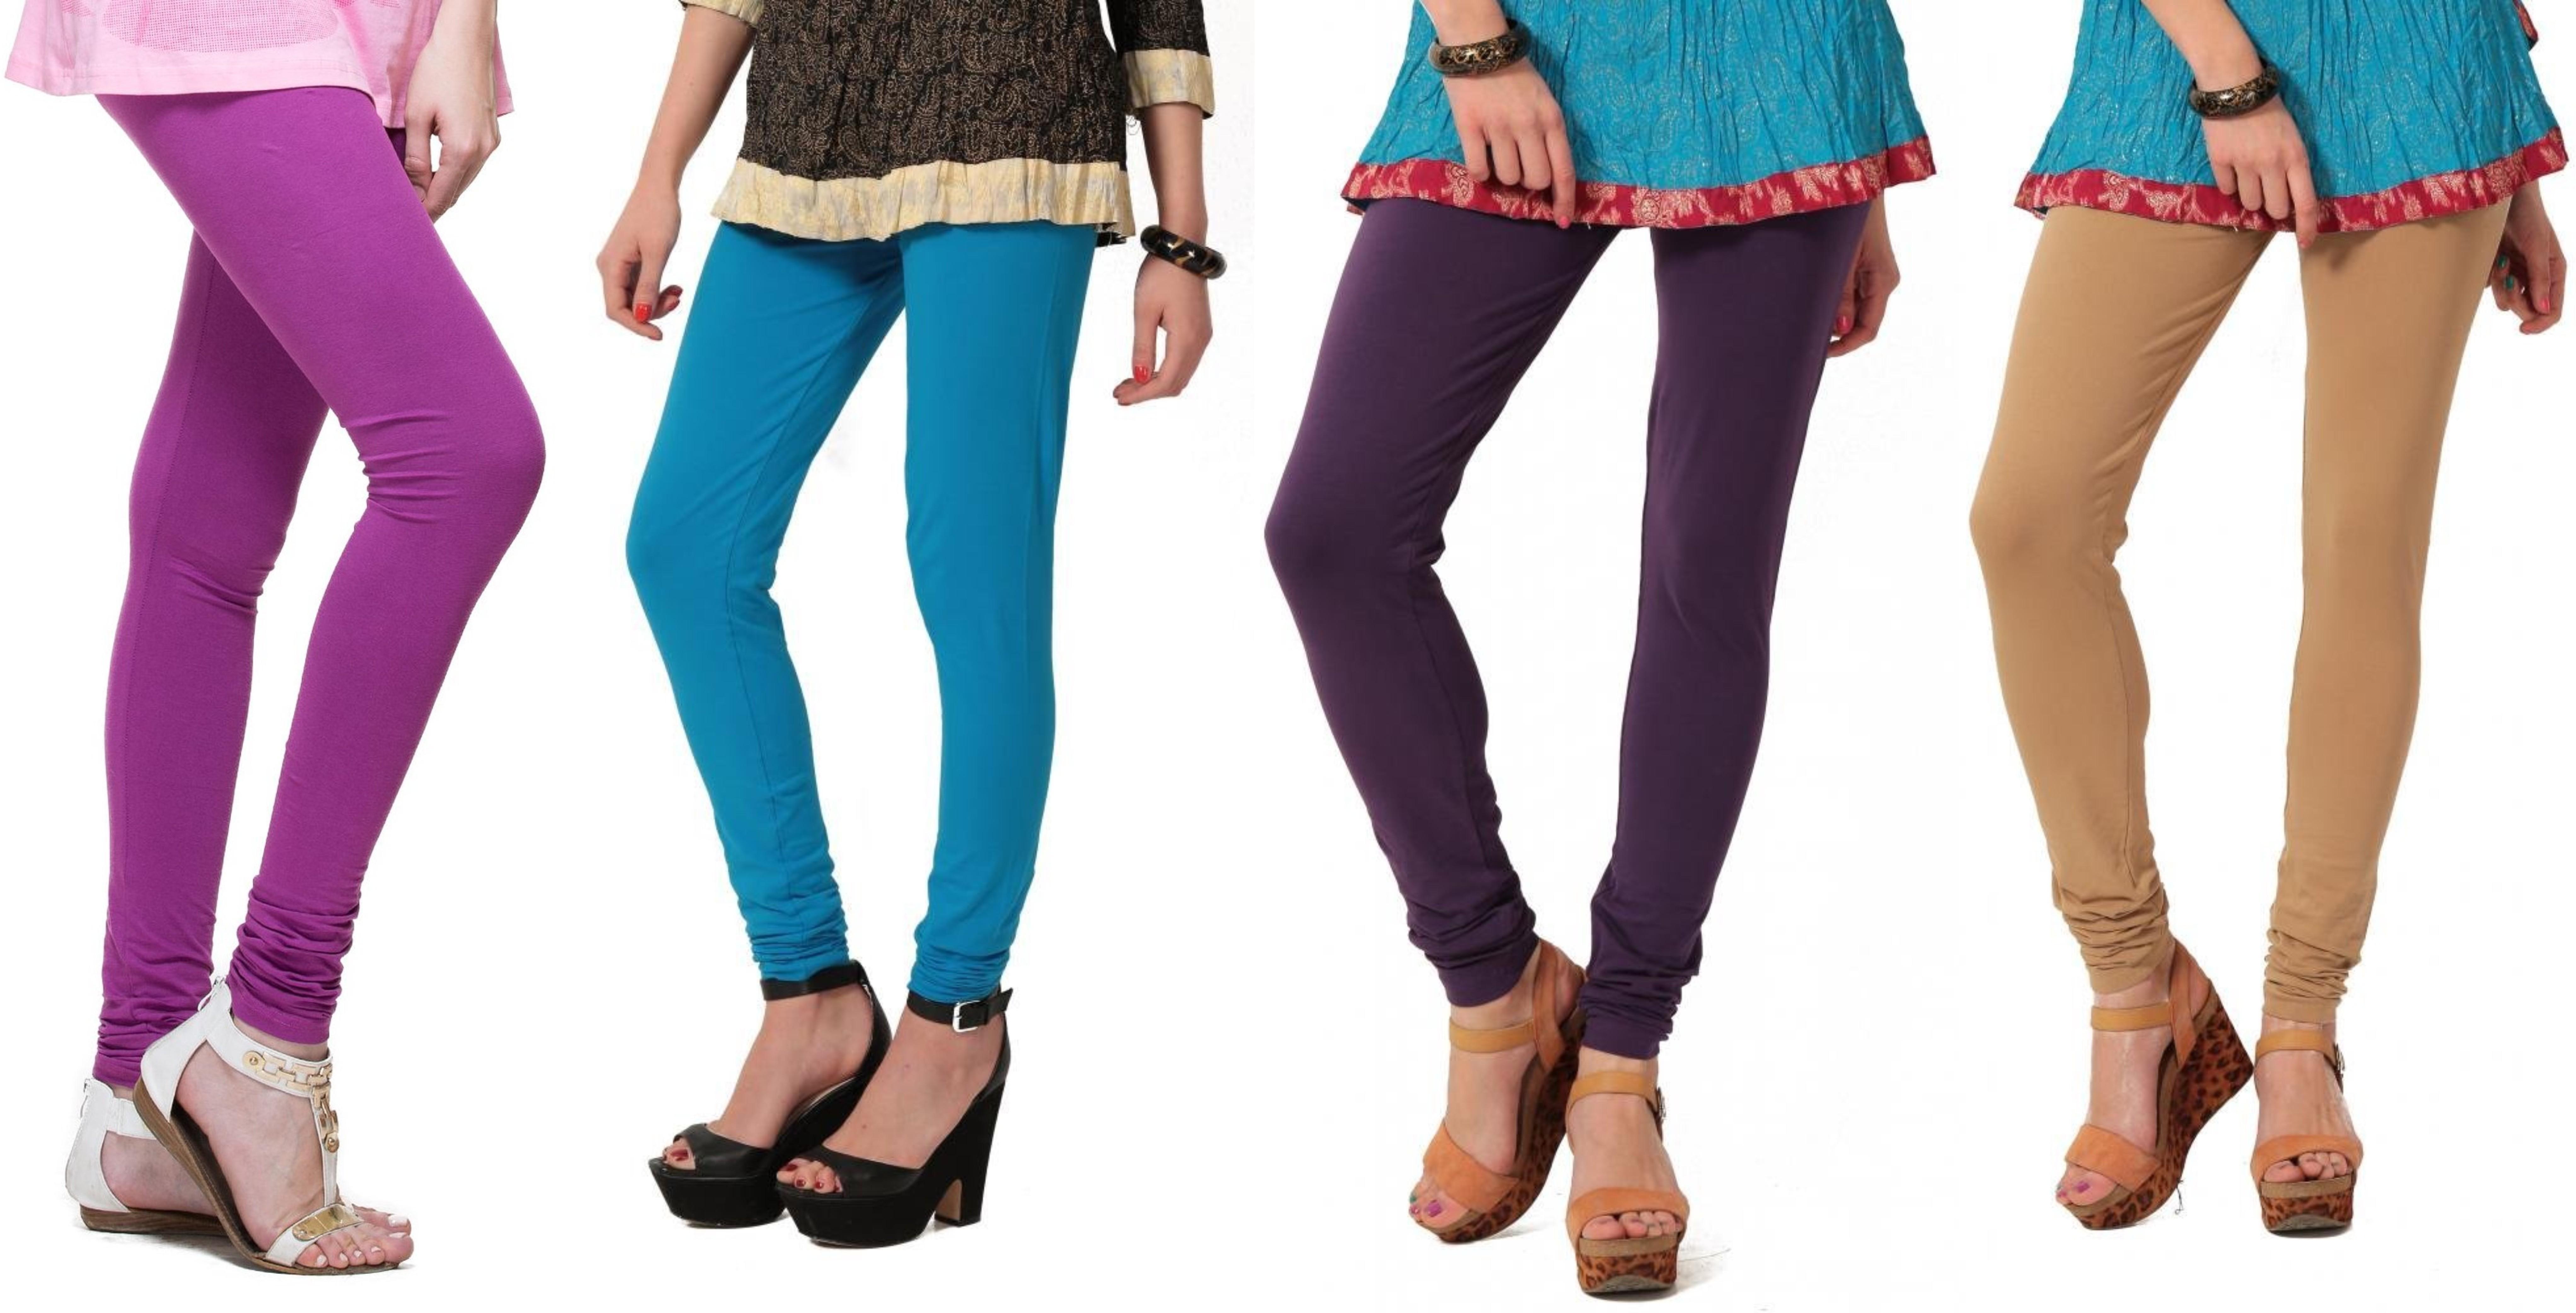 Angel Soft Womens Purple, Light Blue, Purple, Beige Leggings(Pack of 4)